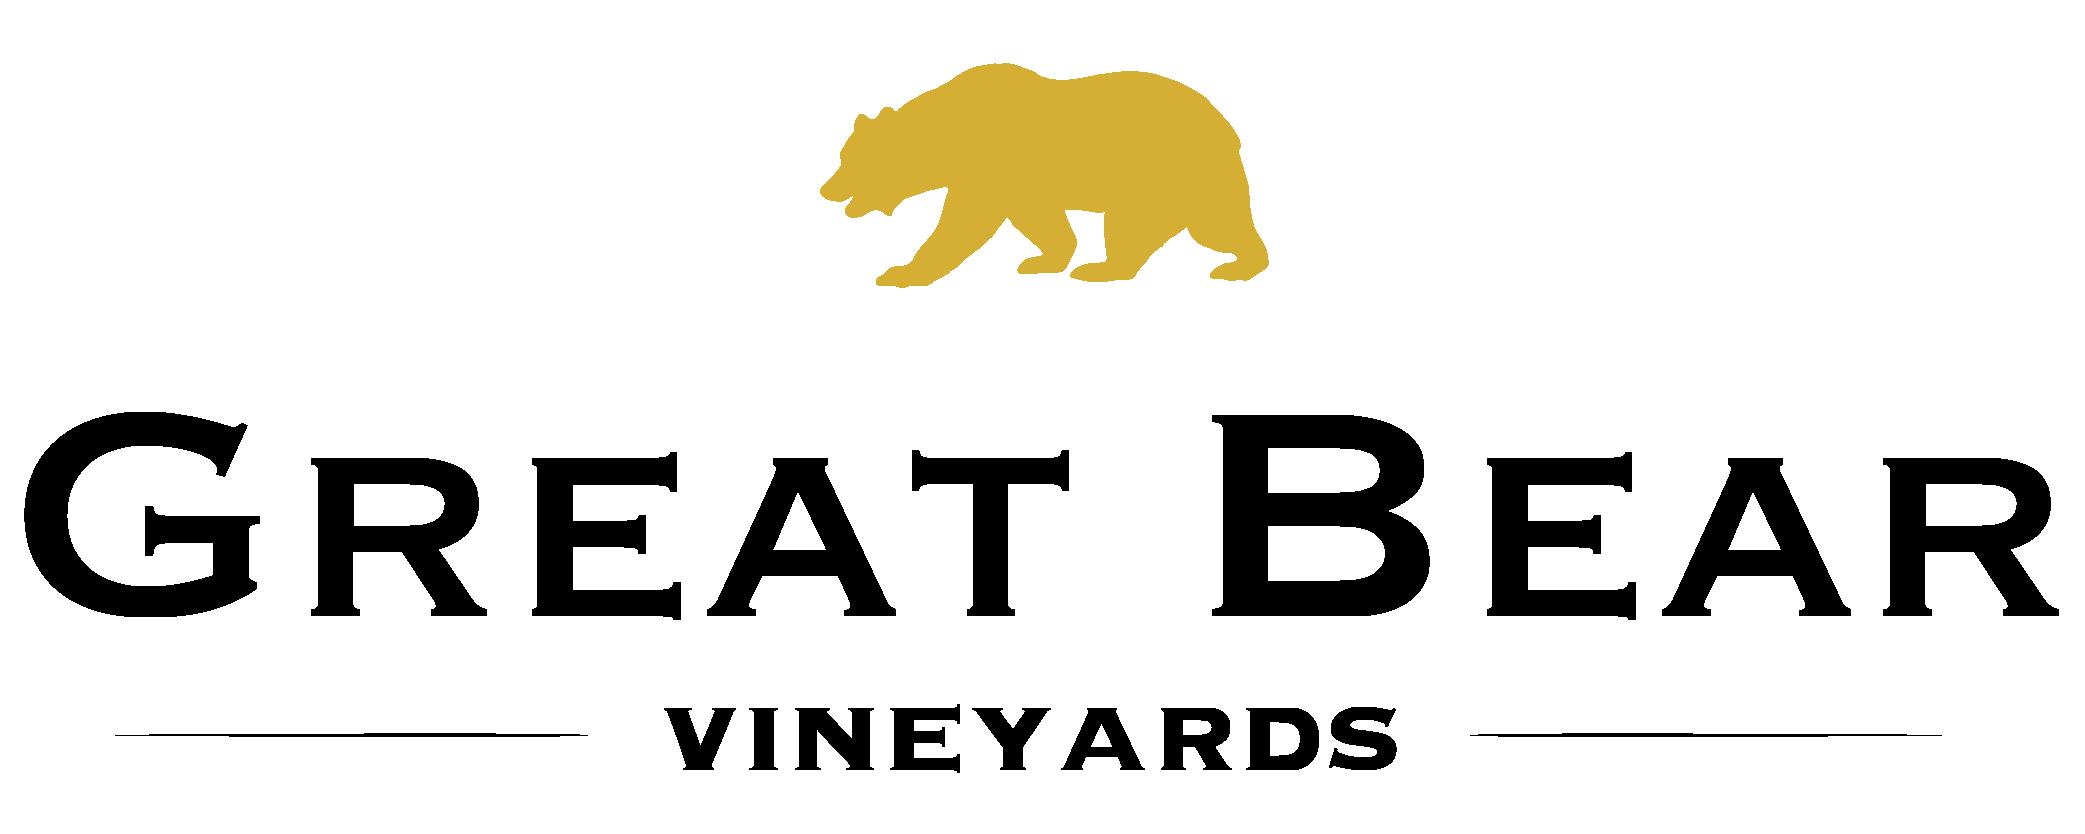 Great Bear Vineyards logo